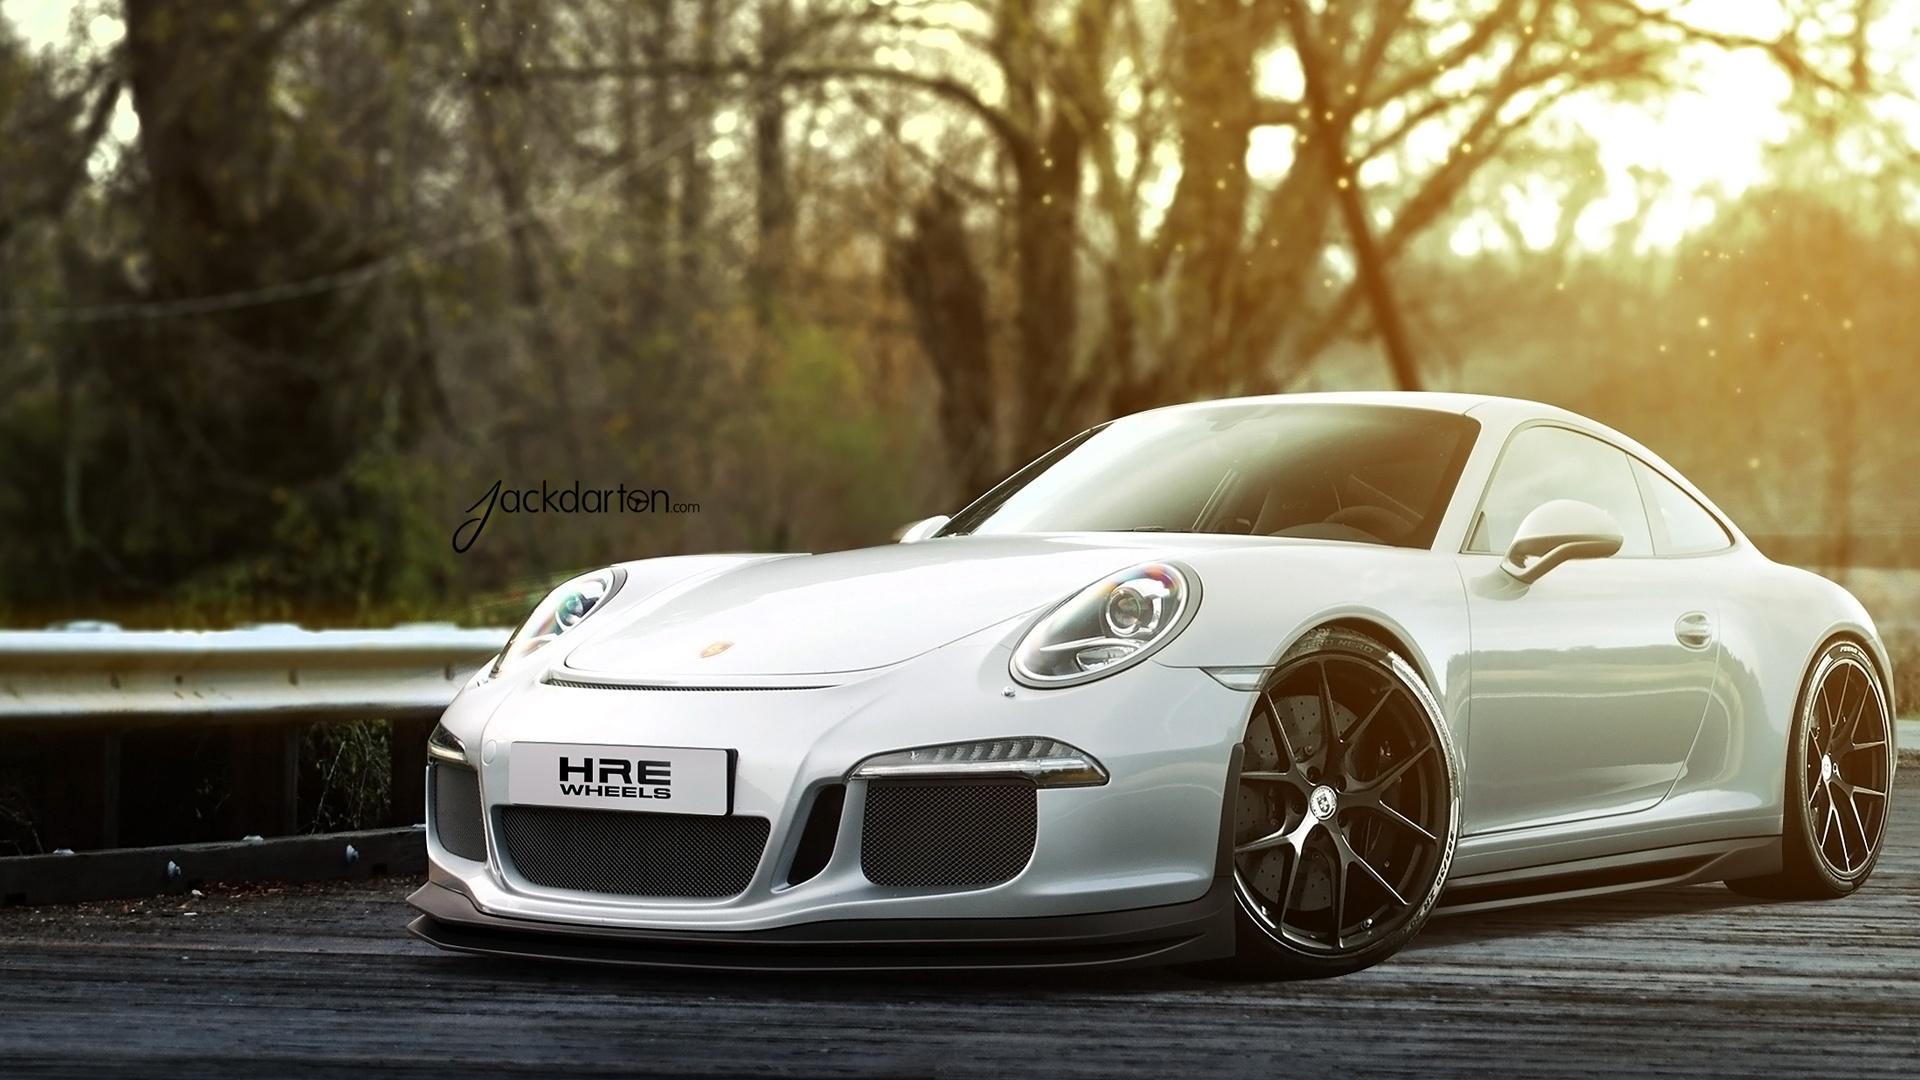 Porsche 911 GT3 Wallpapers in jpg format for free download